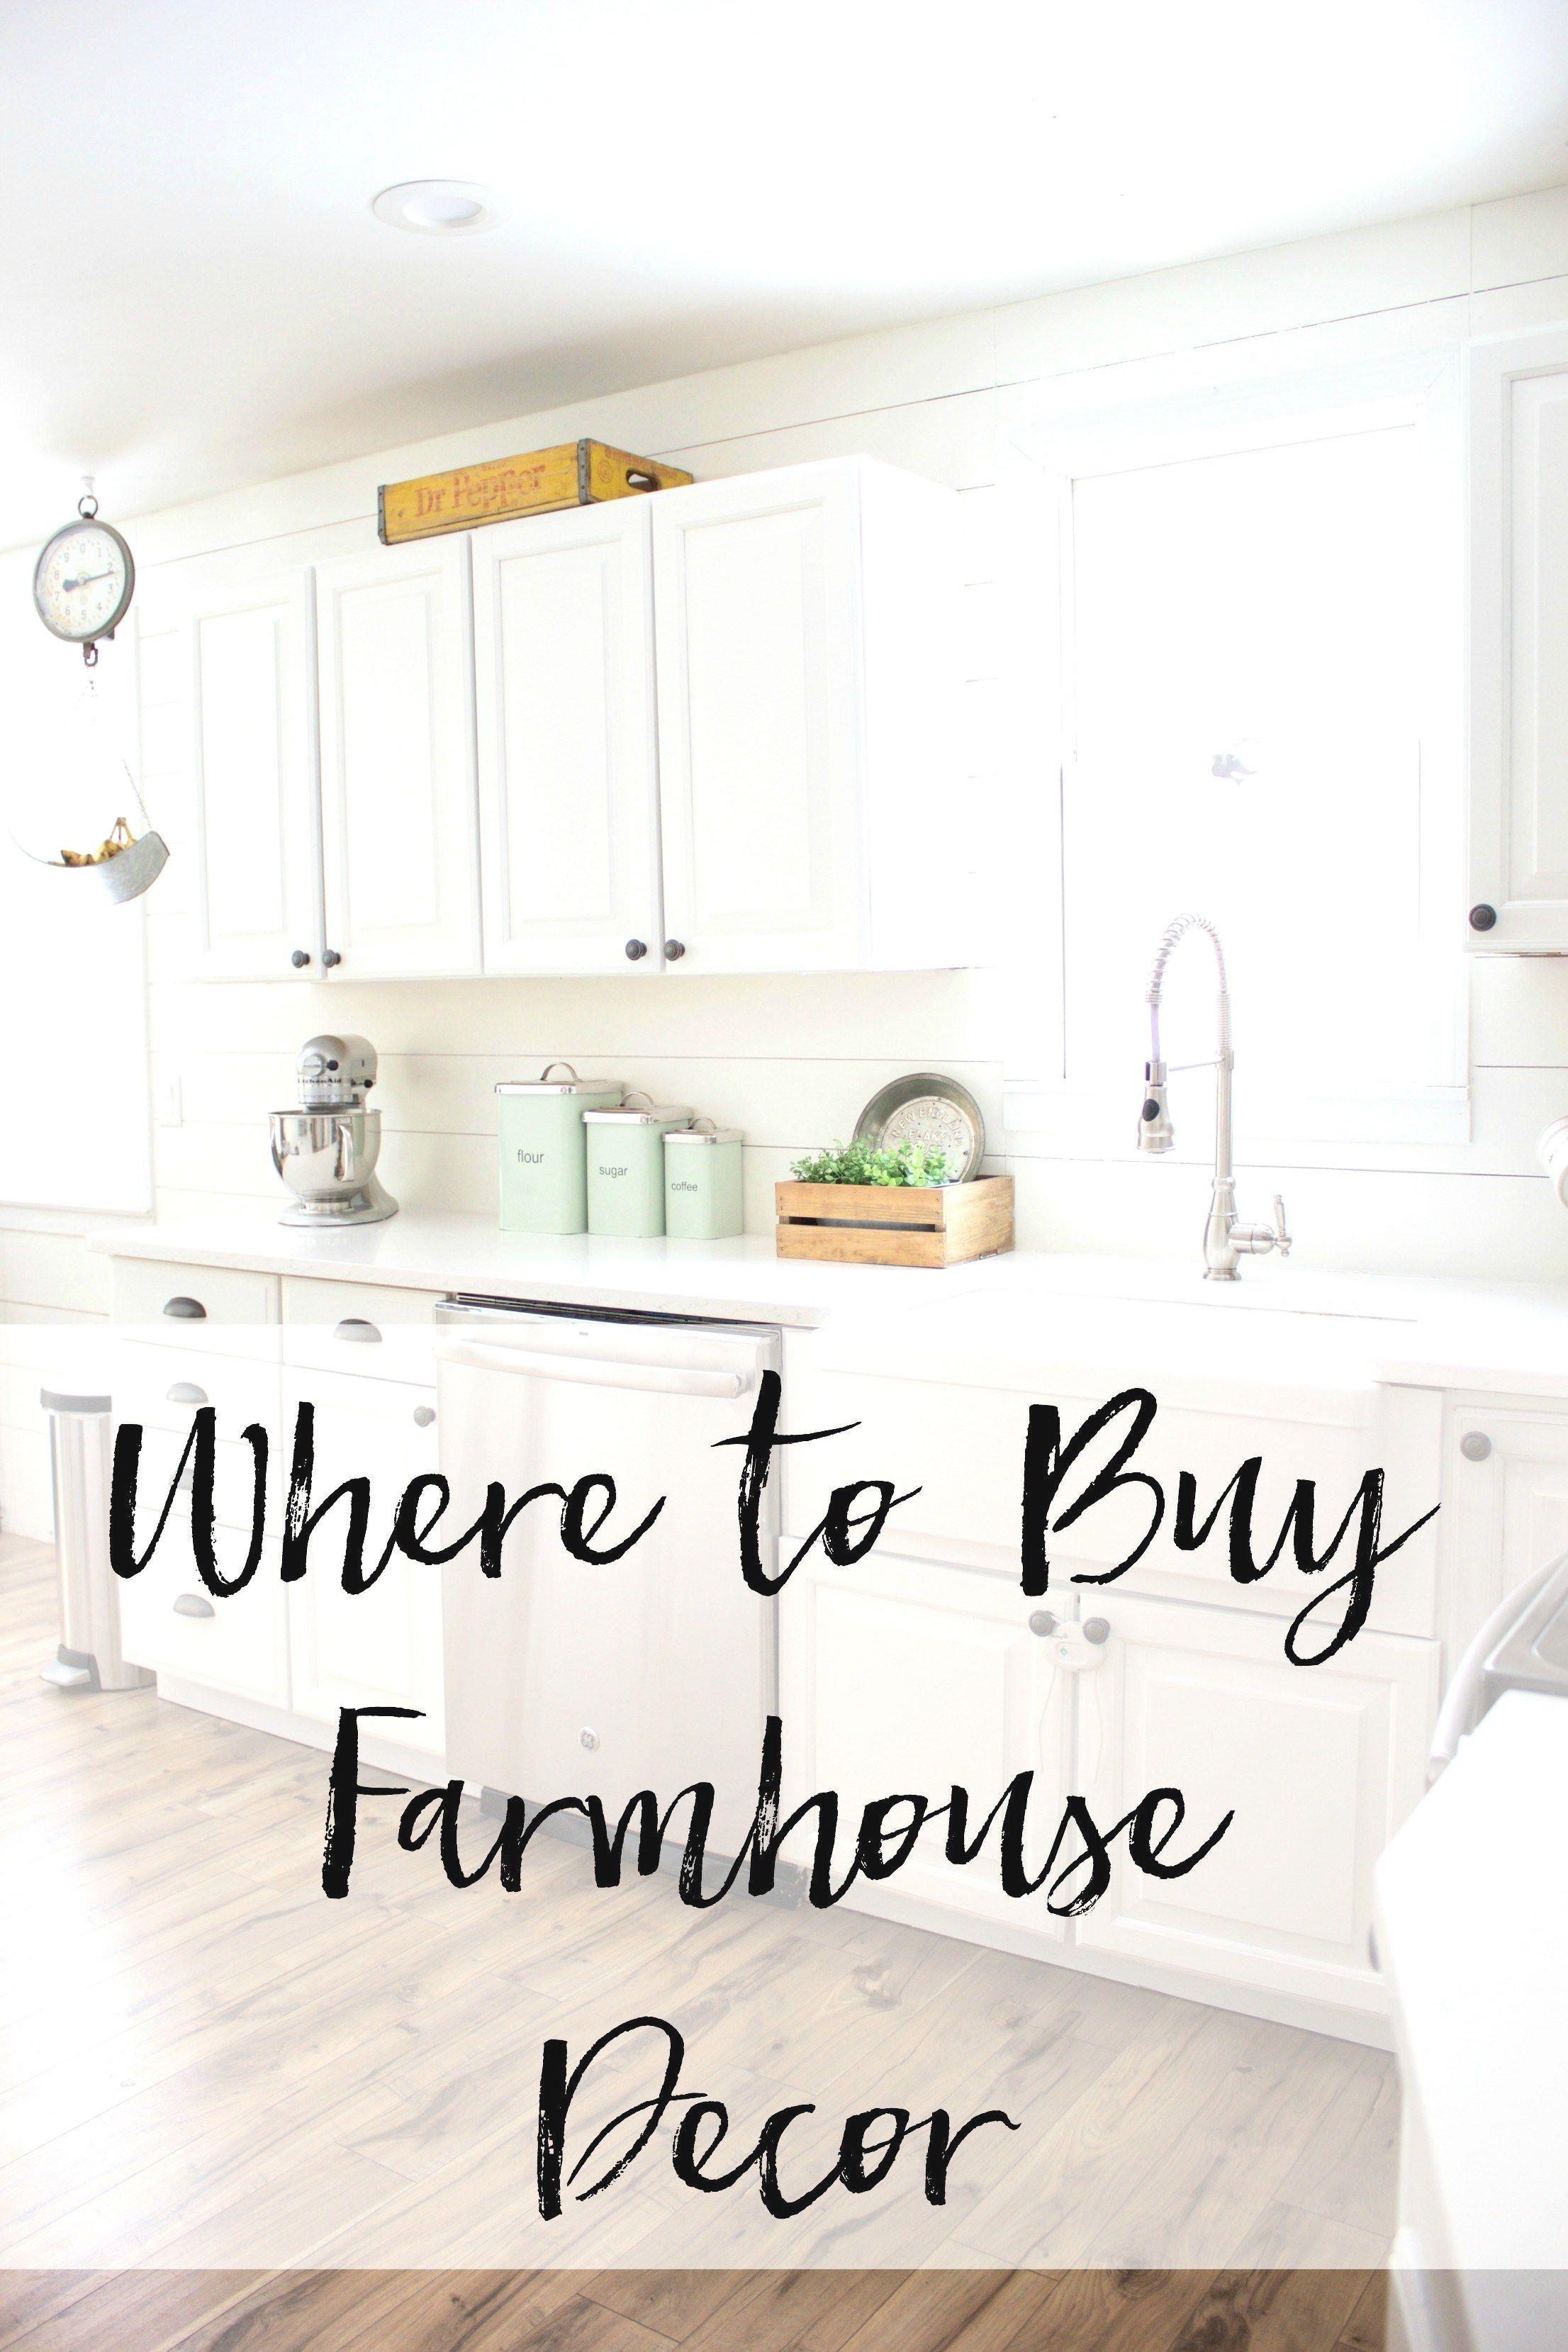 13 Elegant Farmhouse Design Ideas In 2020 Farmhouse Interior Design Farmhouse Interior Country House Decor